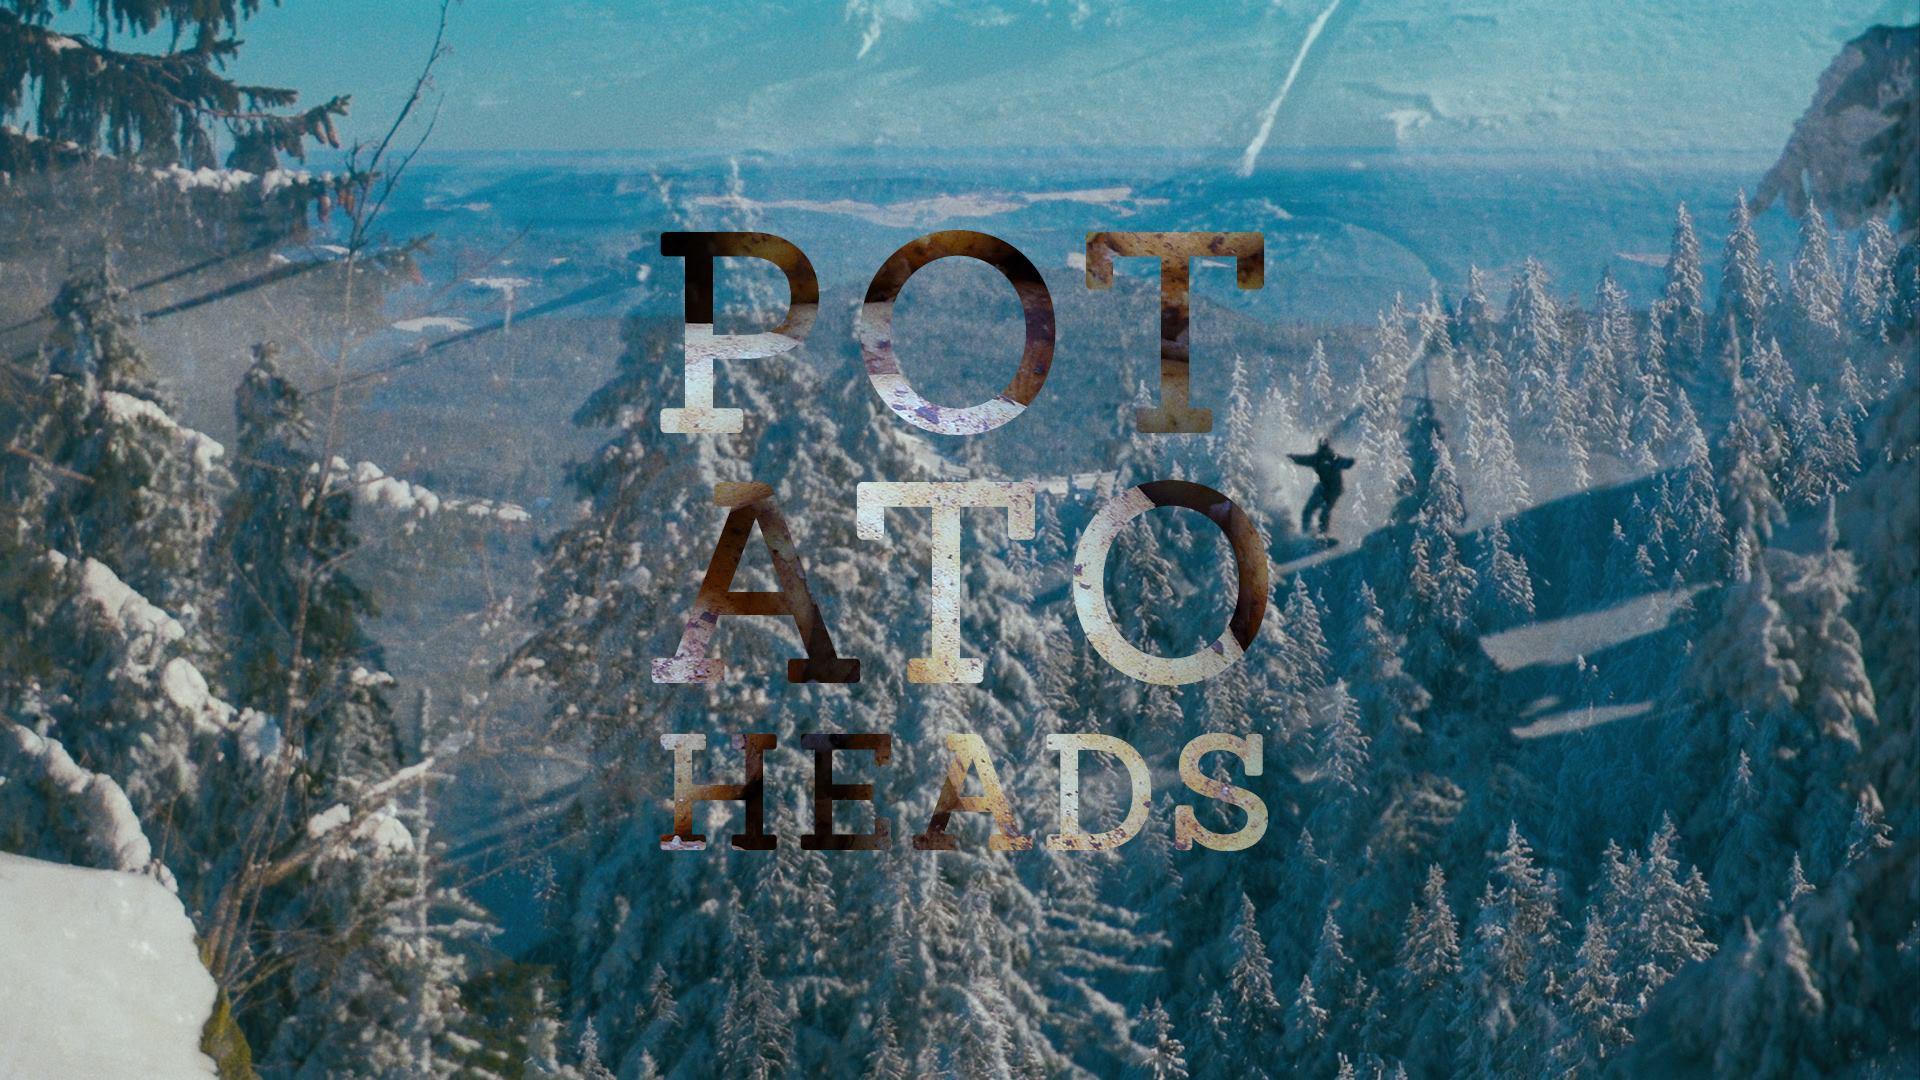 Potatoheads – Snowboardvideopremiere in Freiburg || 7.12.18